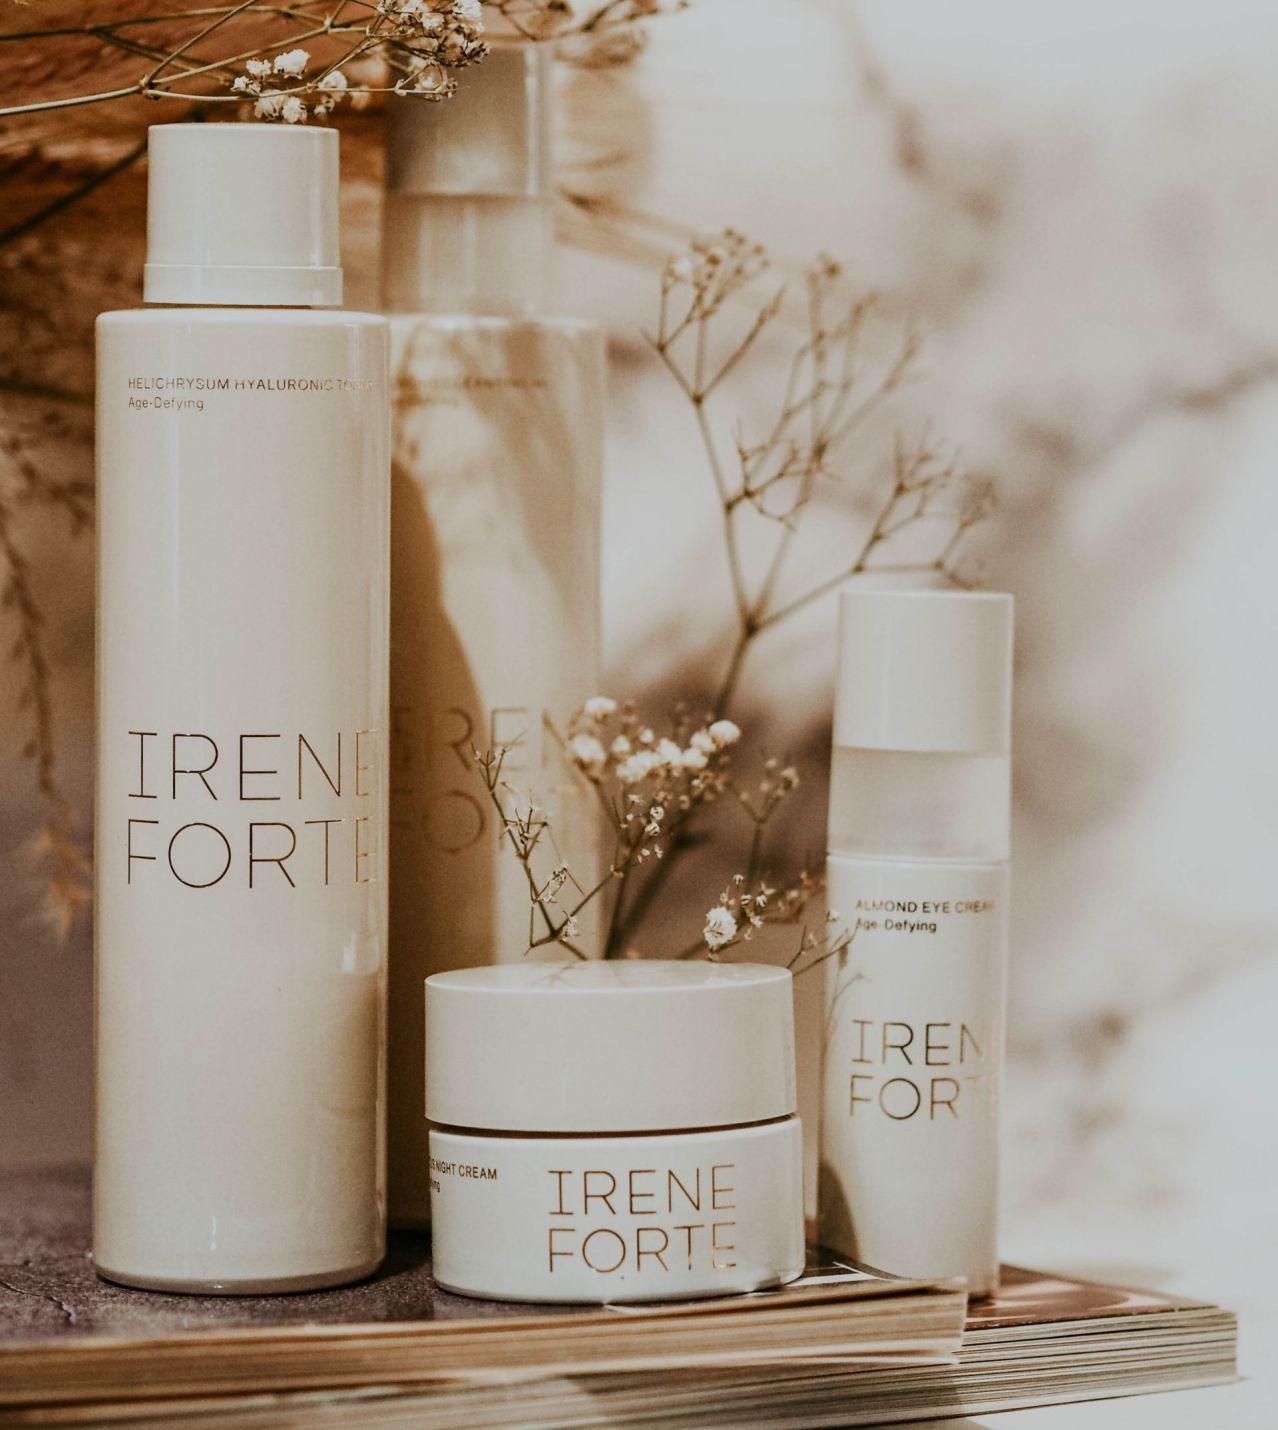 Irene Forte Skincare Review Kate Winney Hibiscus Night Cream Helichrysum Hyaluronic Toner Almond Cleansing Milk Eye Cream